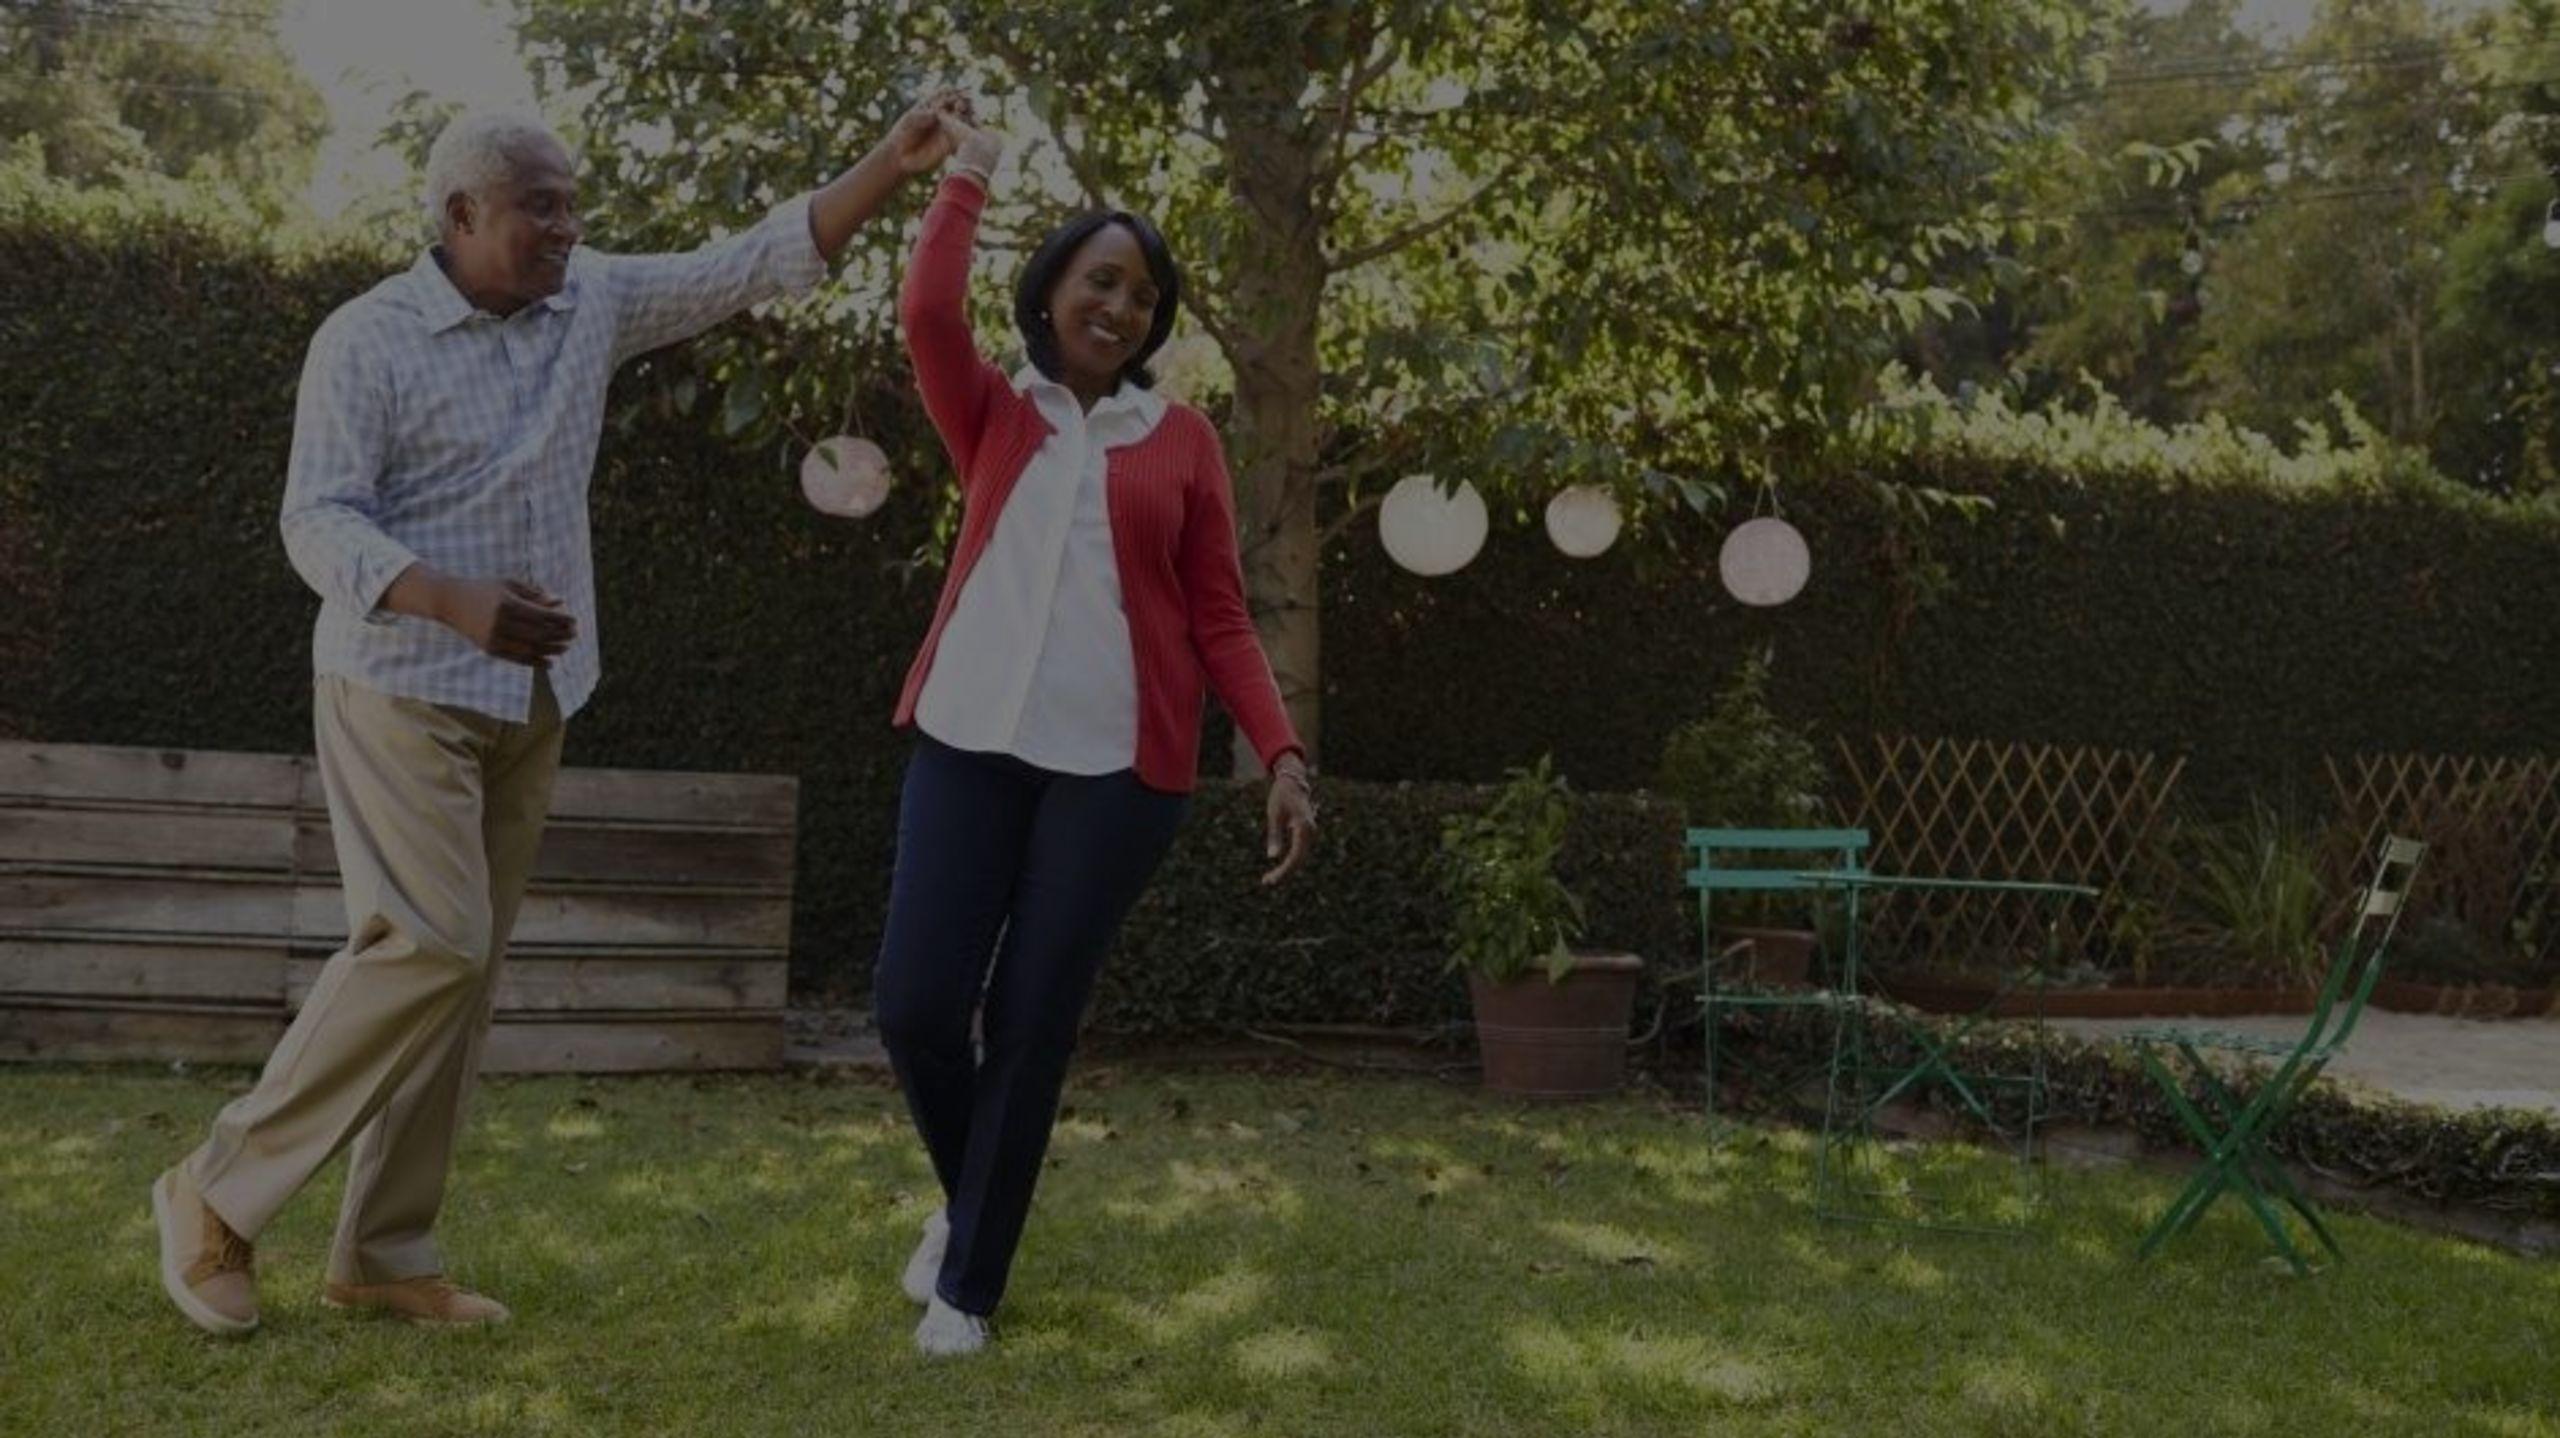 Dance in your own backyard